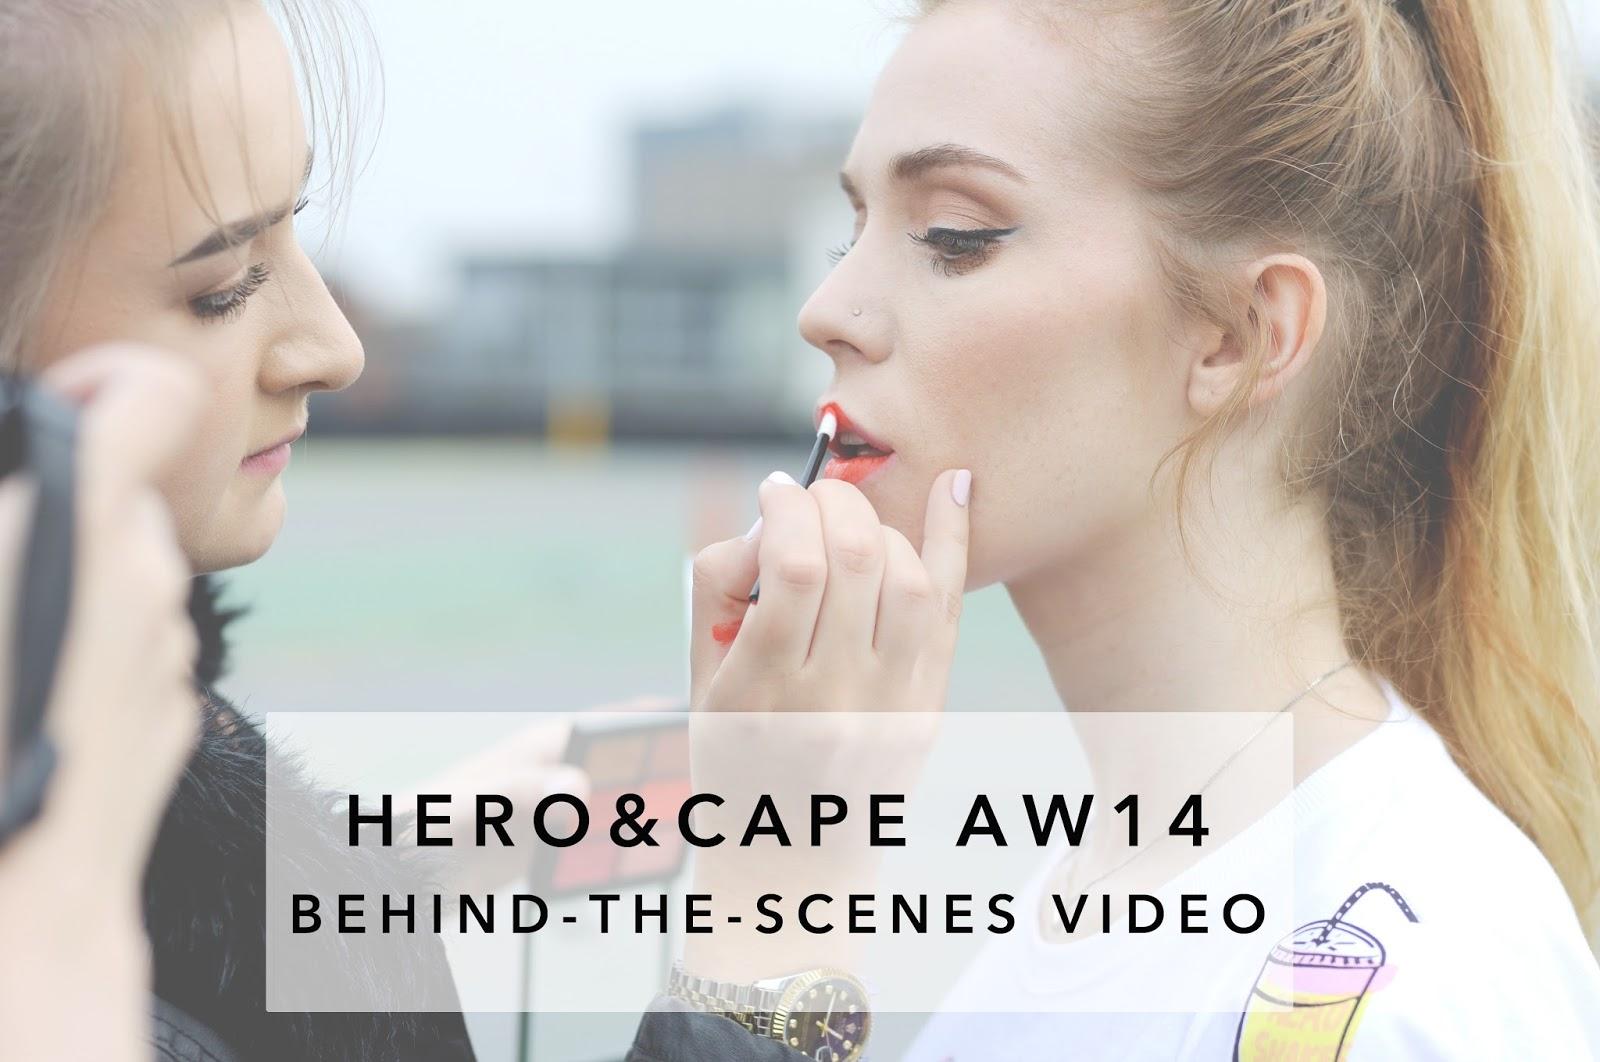 hero&cape photoshoot, hero and cape autumn winter 2014, hero and cape tshirts, hero and cape